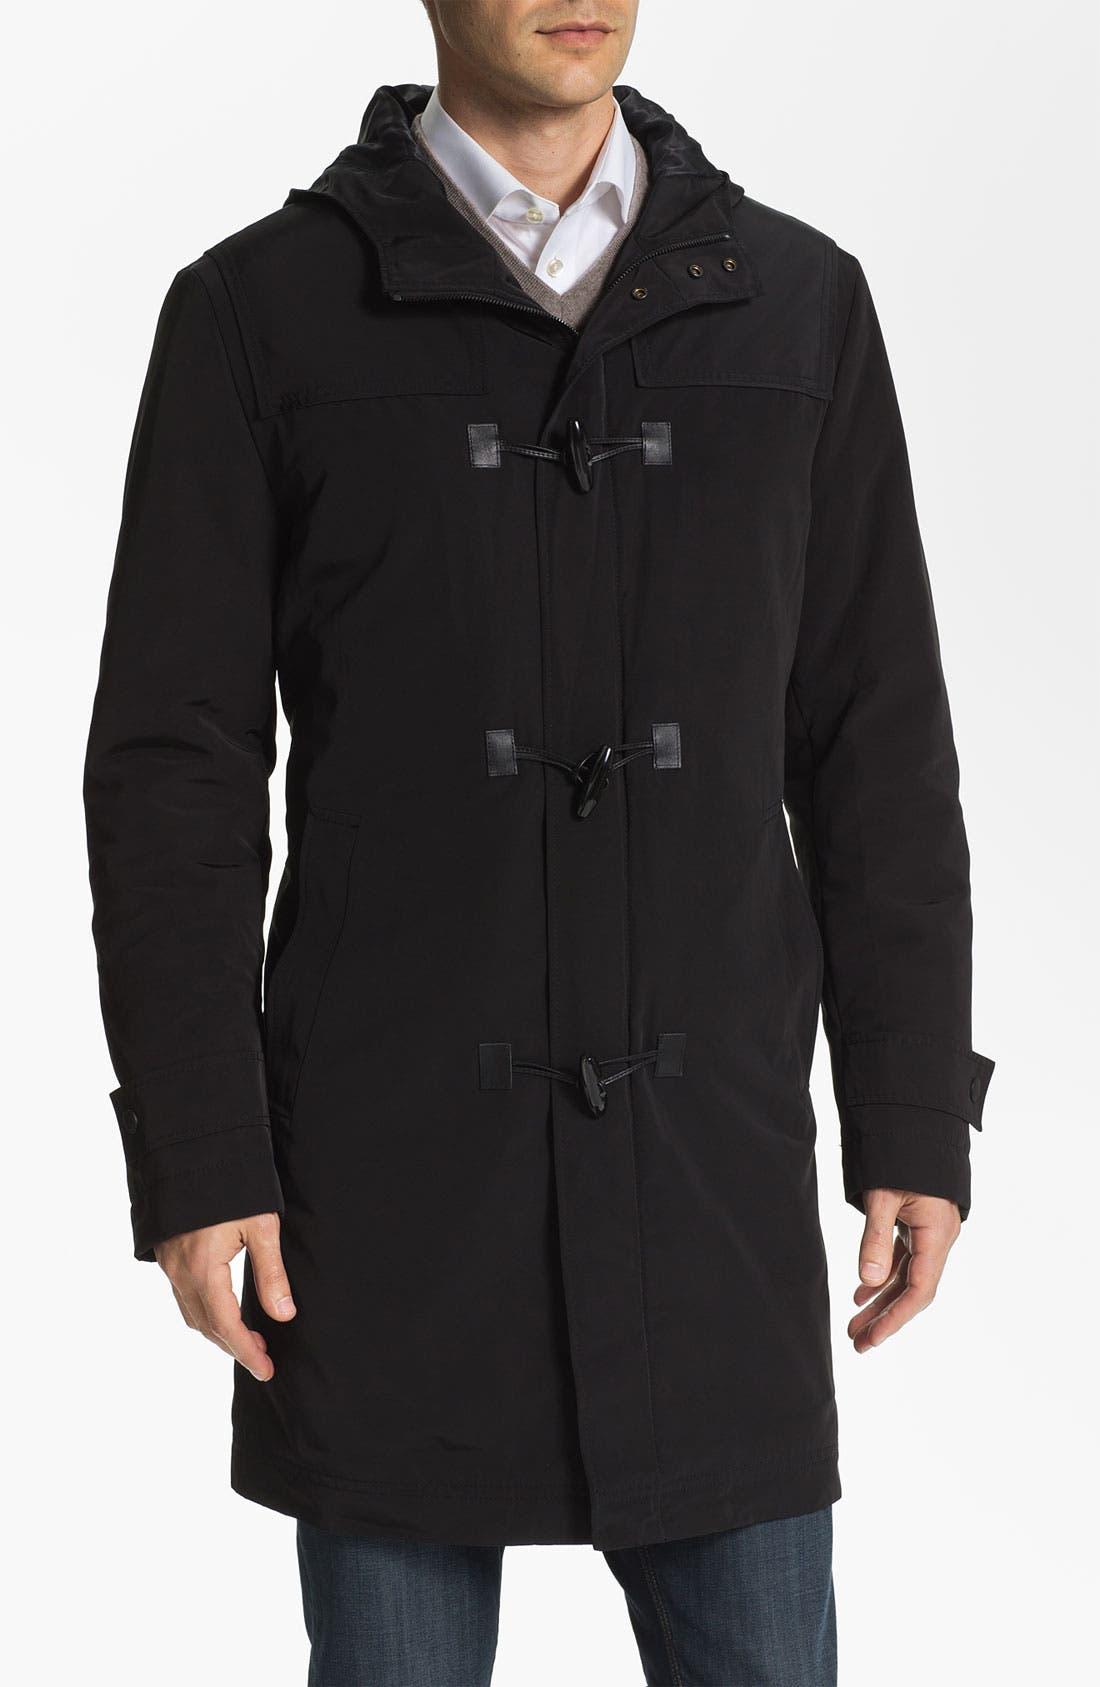 Main Image - BOSS Black 'Glade' Wrinkle Resistant Duffle Coat